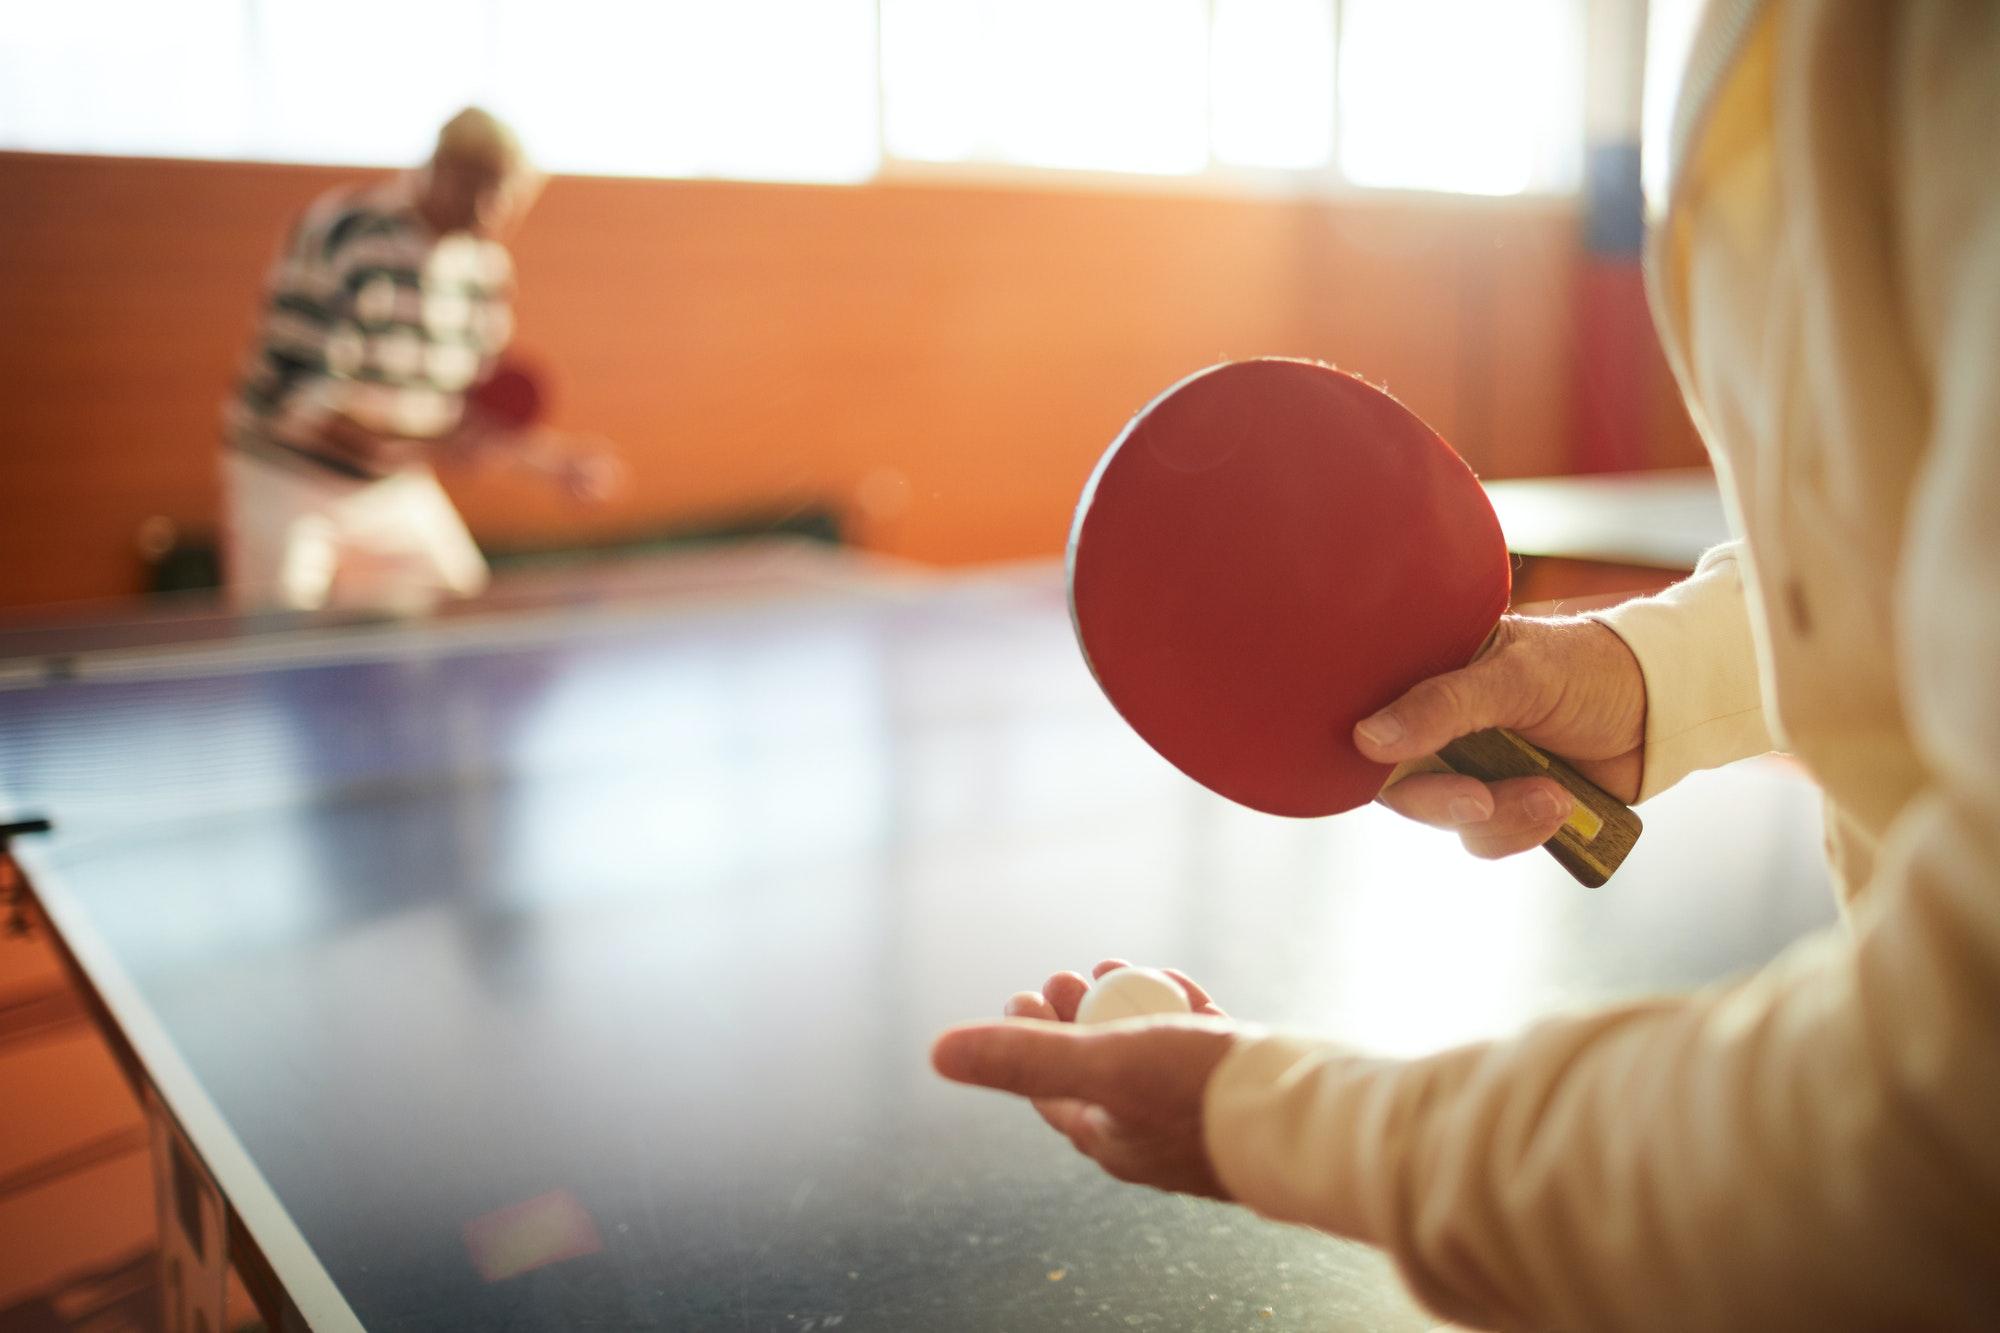 Ping pong supplies